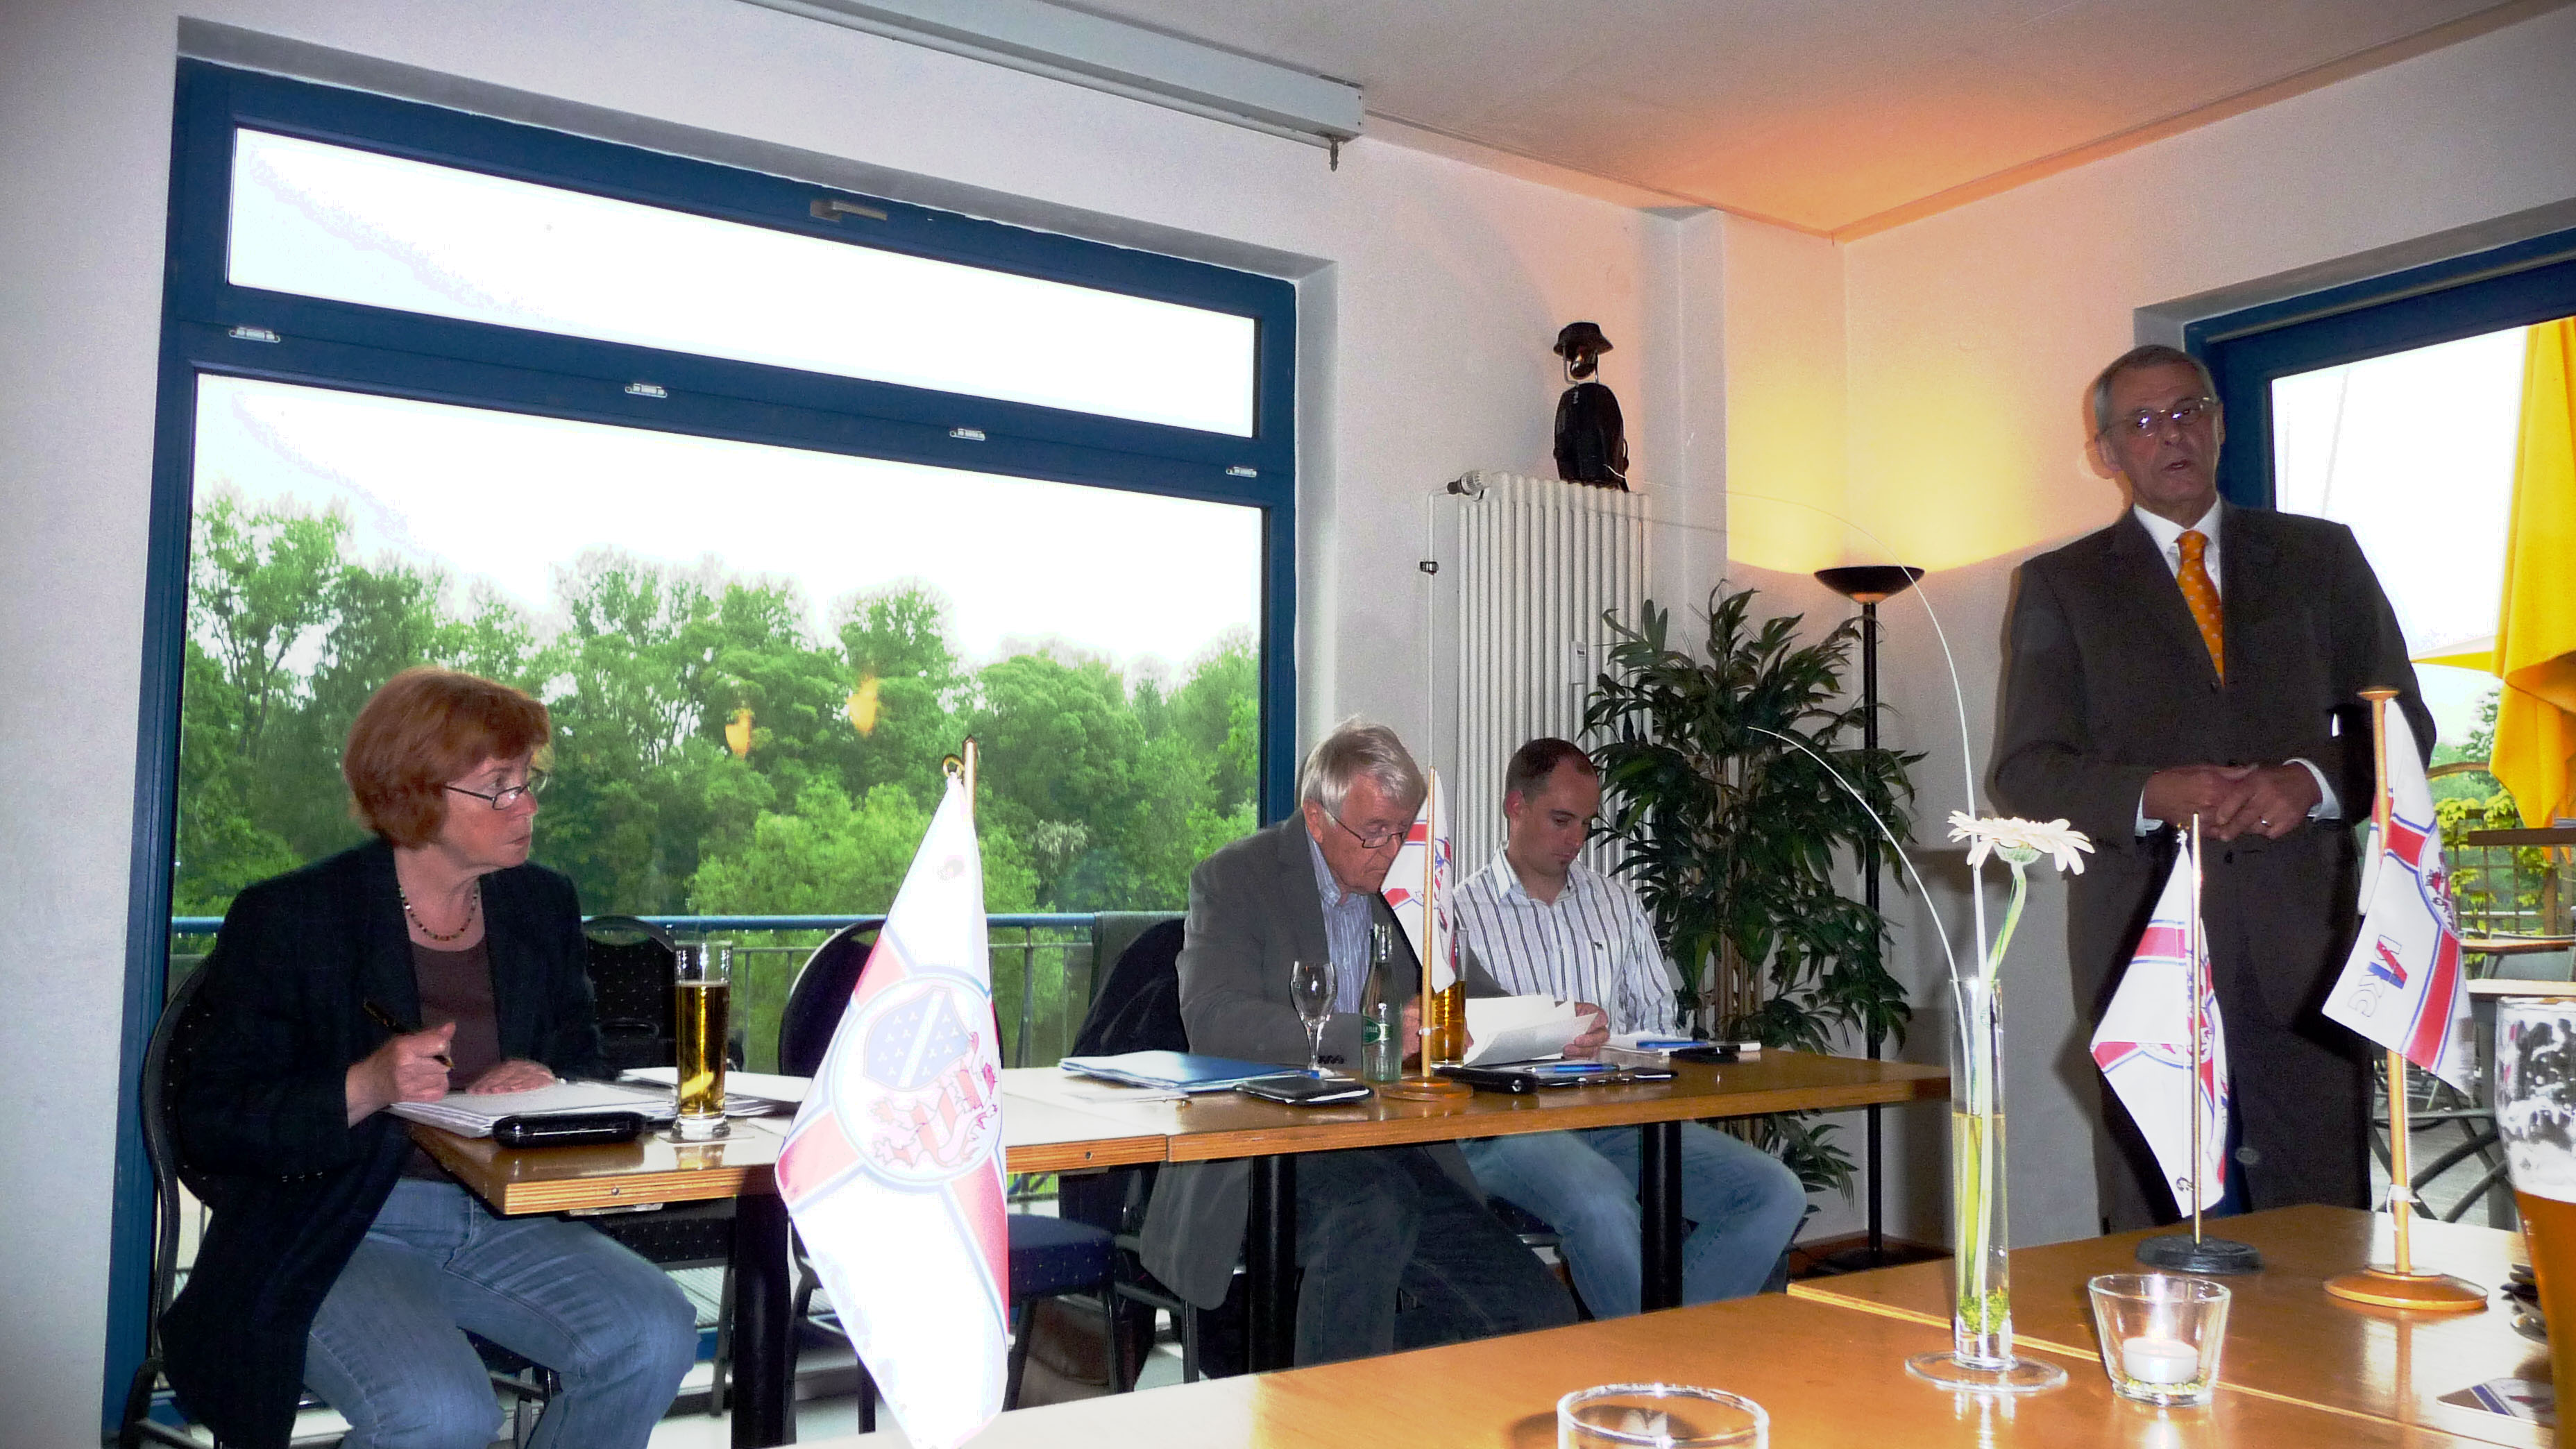 Mitgliederversammlung Vorstand Frank Oberbrunner, v.l. I.Wunderlich, Dr. R. Knauff, M. Feldmann